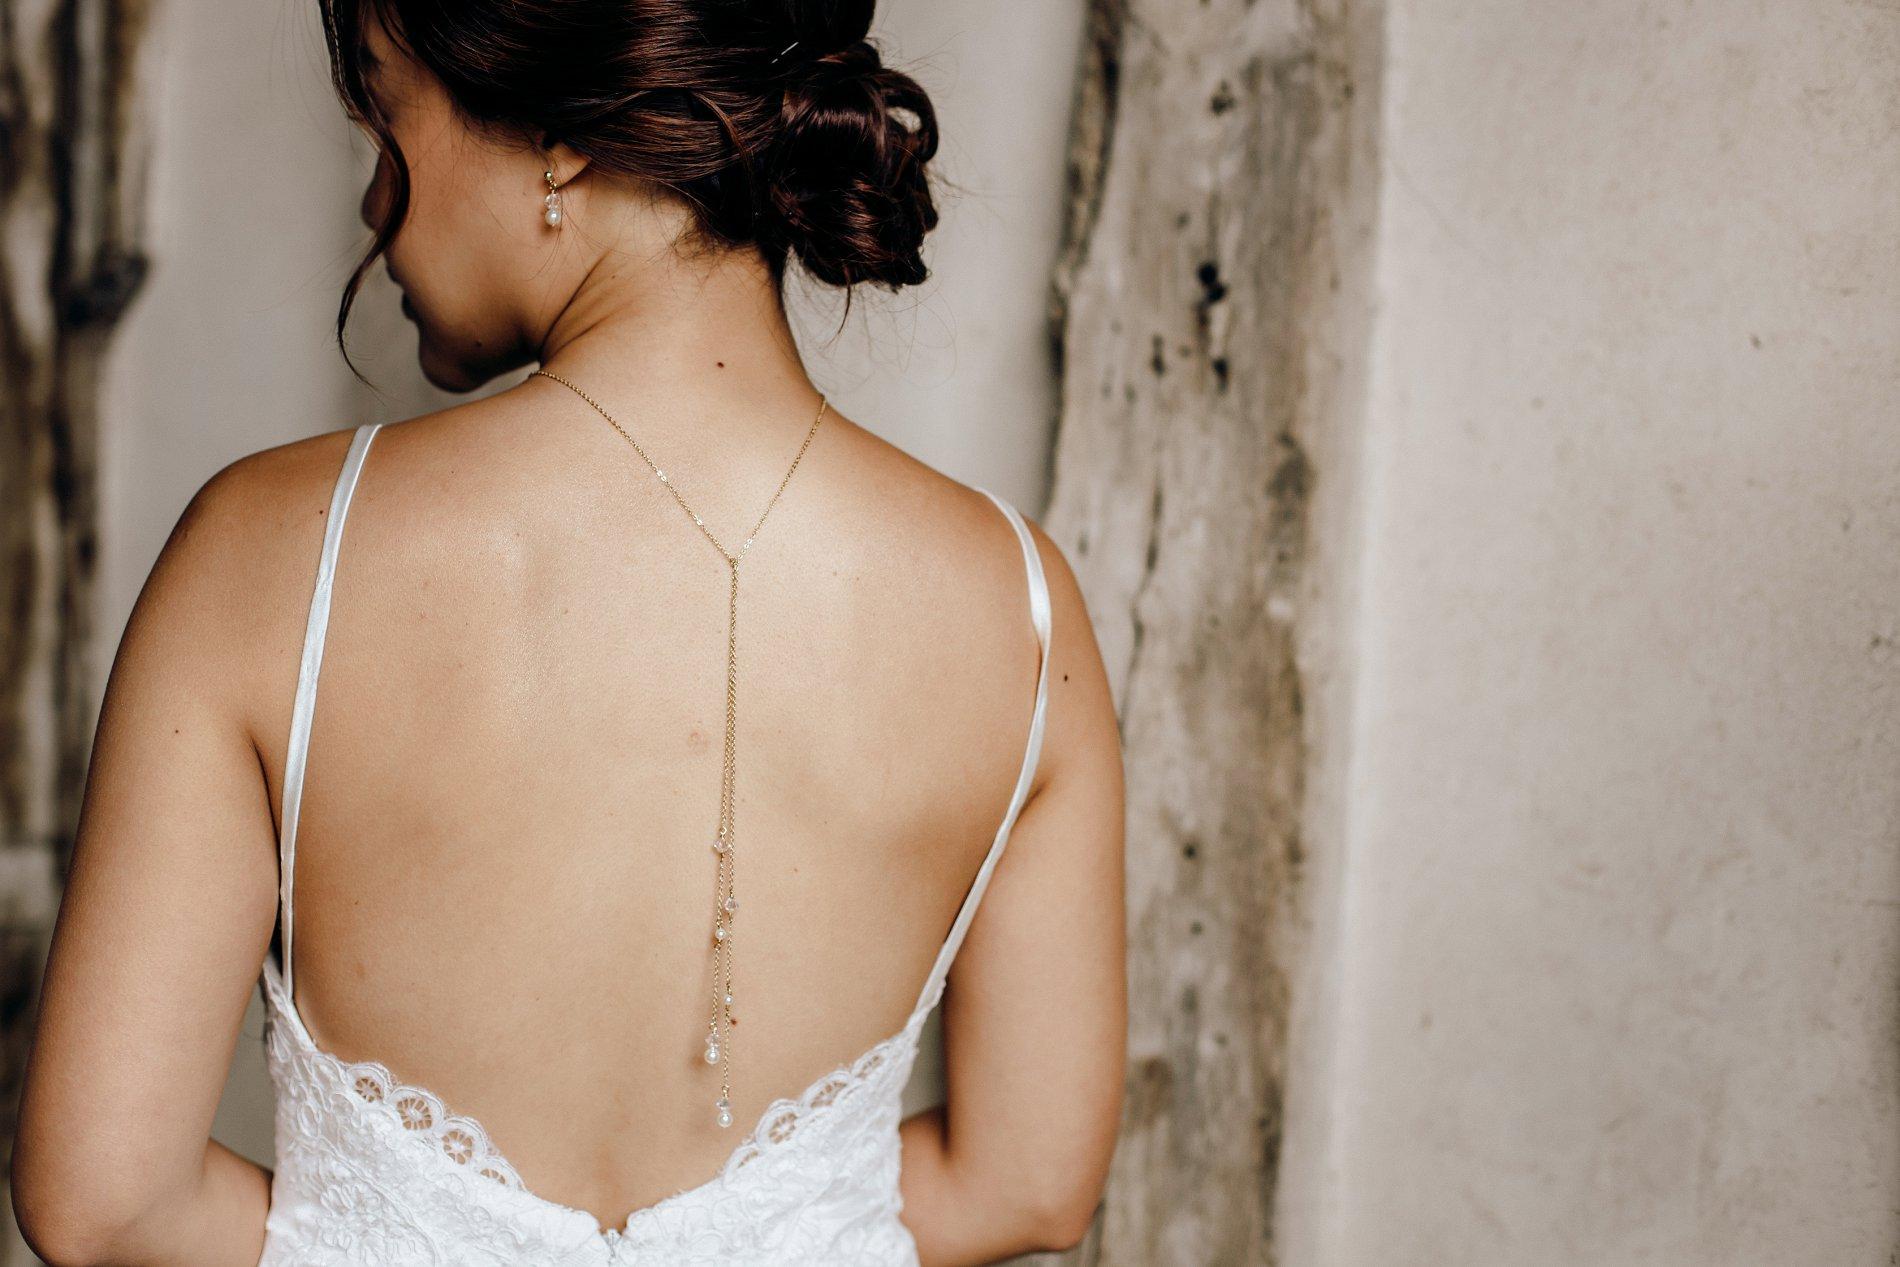 A Golden Boho Wedding Shoot at Cressing Temple Barns (c) Kate Boston Photography (5)